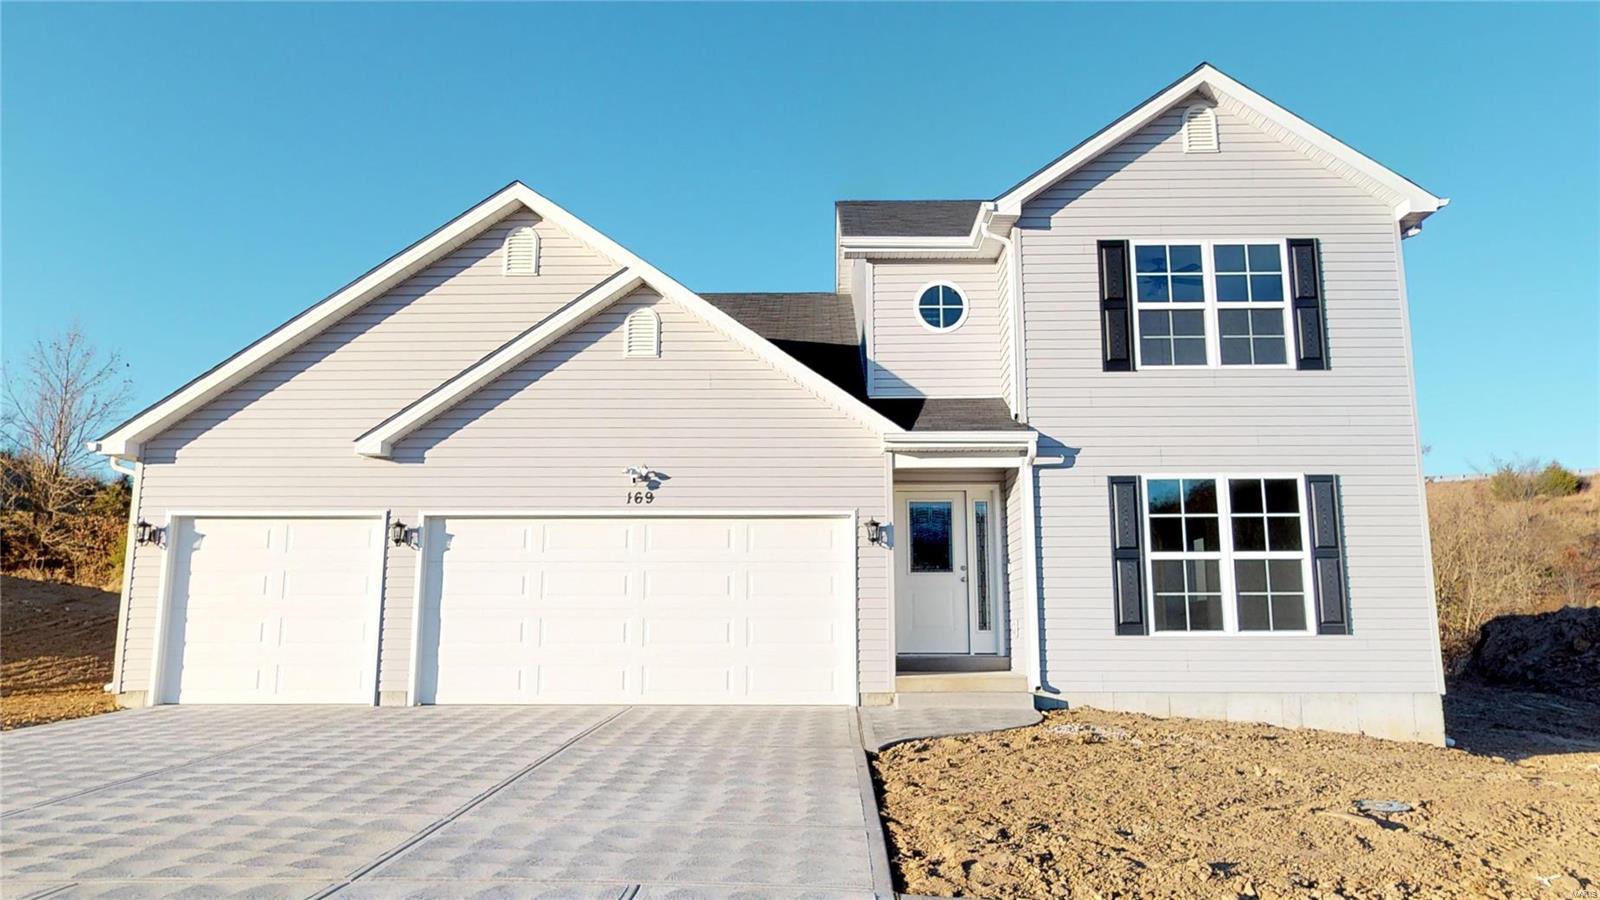 0 Claiborne @ Providence Property Photo - Herculaneum, MO real estate listing